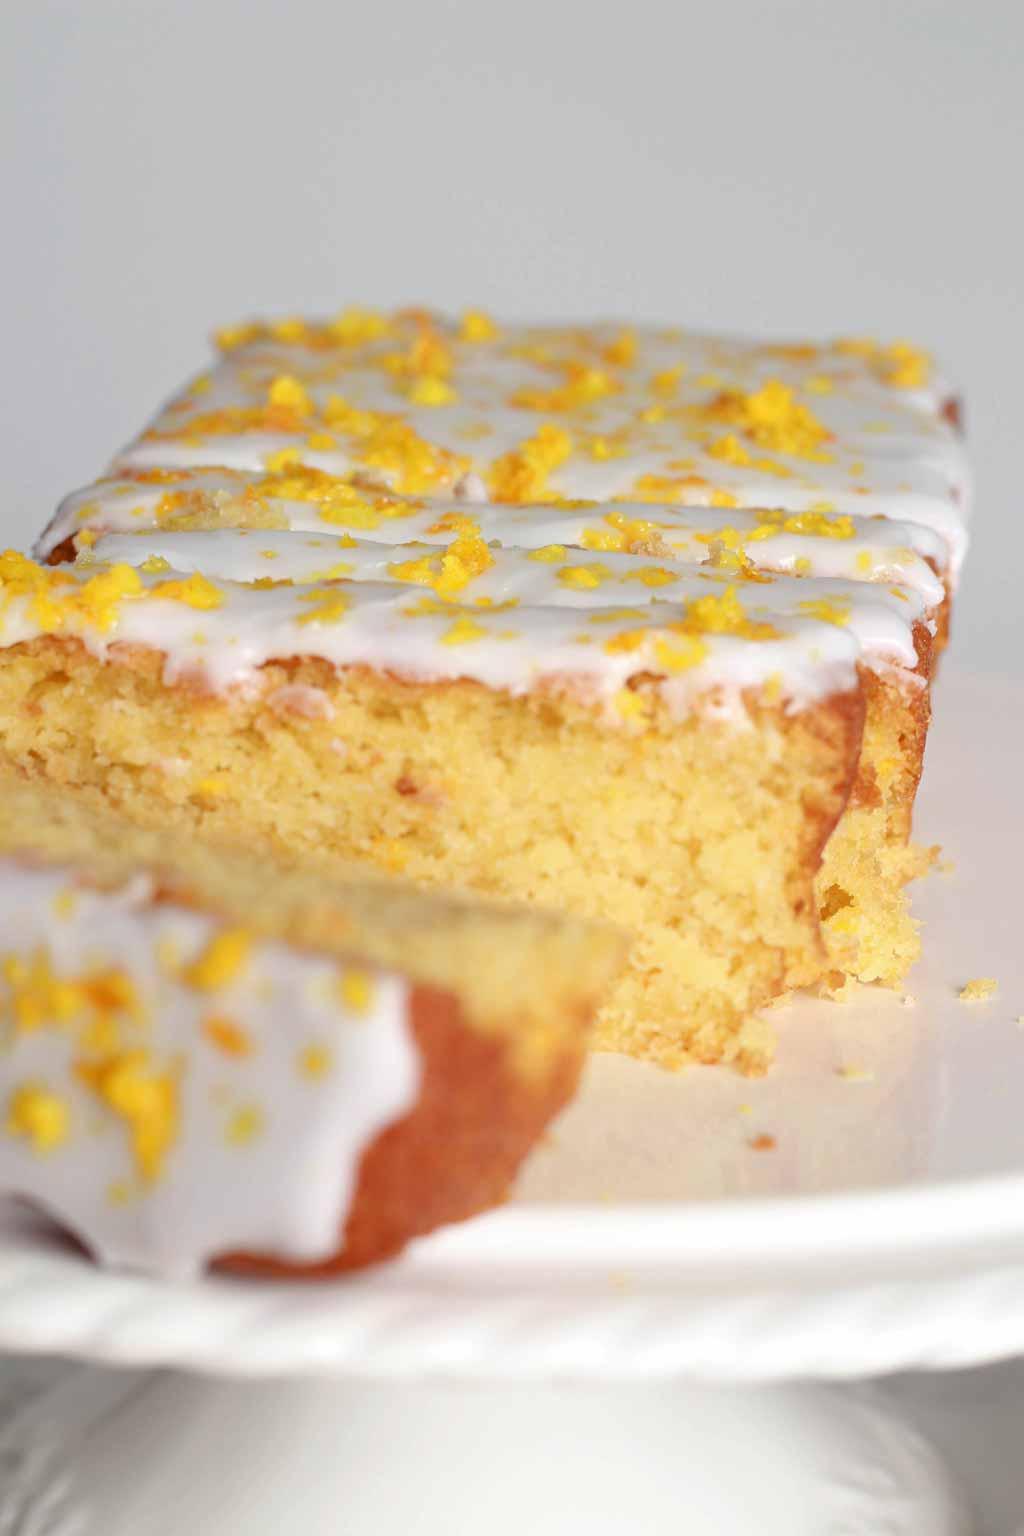 Sliced Loaf Cake On A Cake Stand